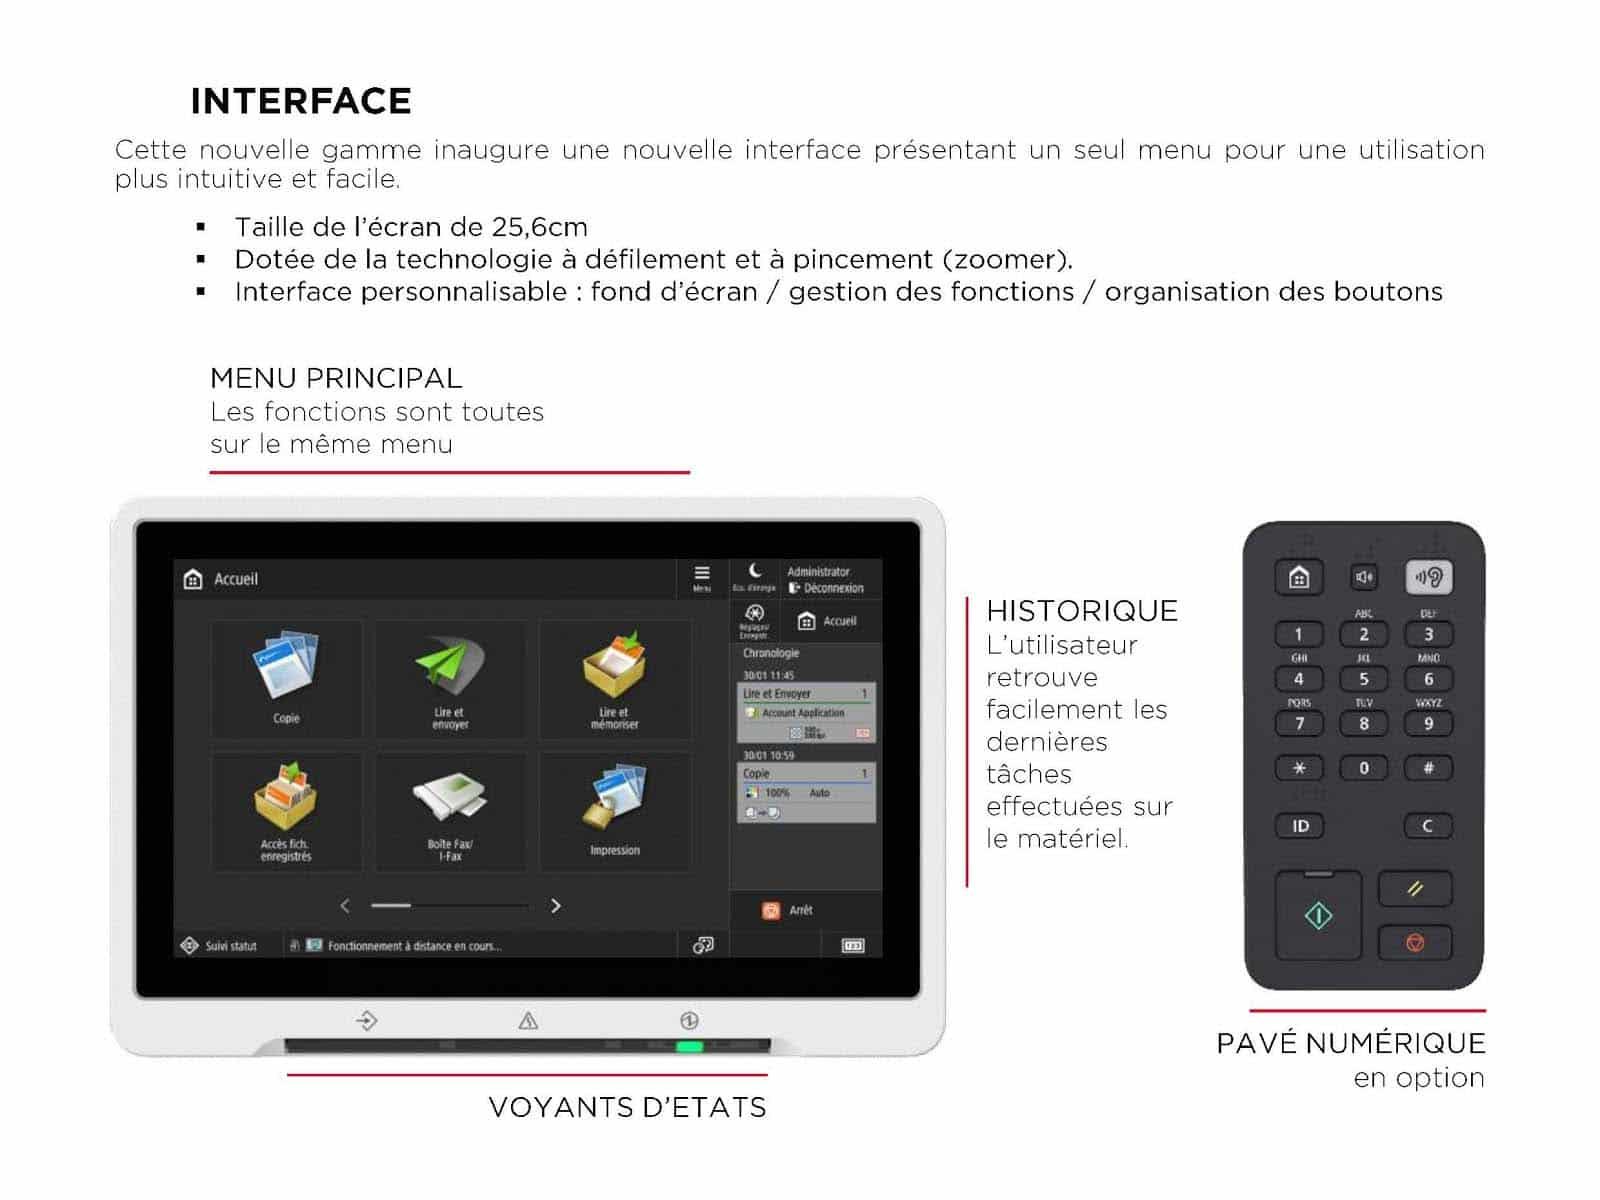 hexacom-impression-interface-gamme-dx